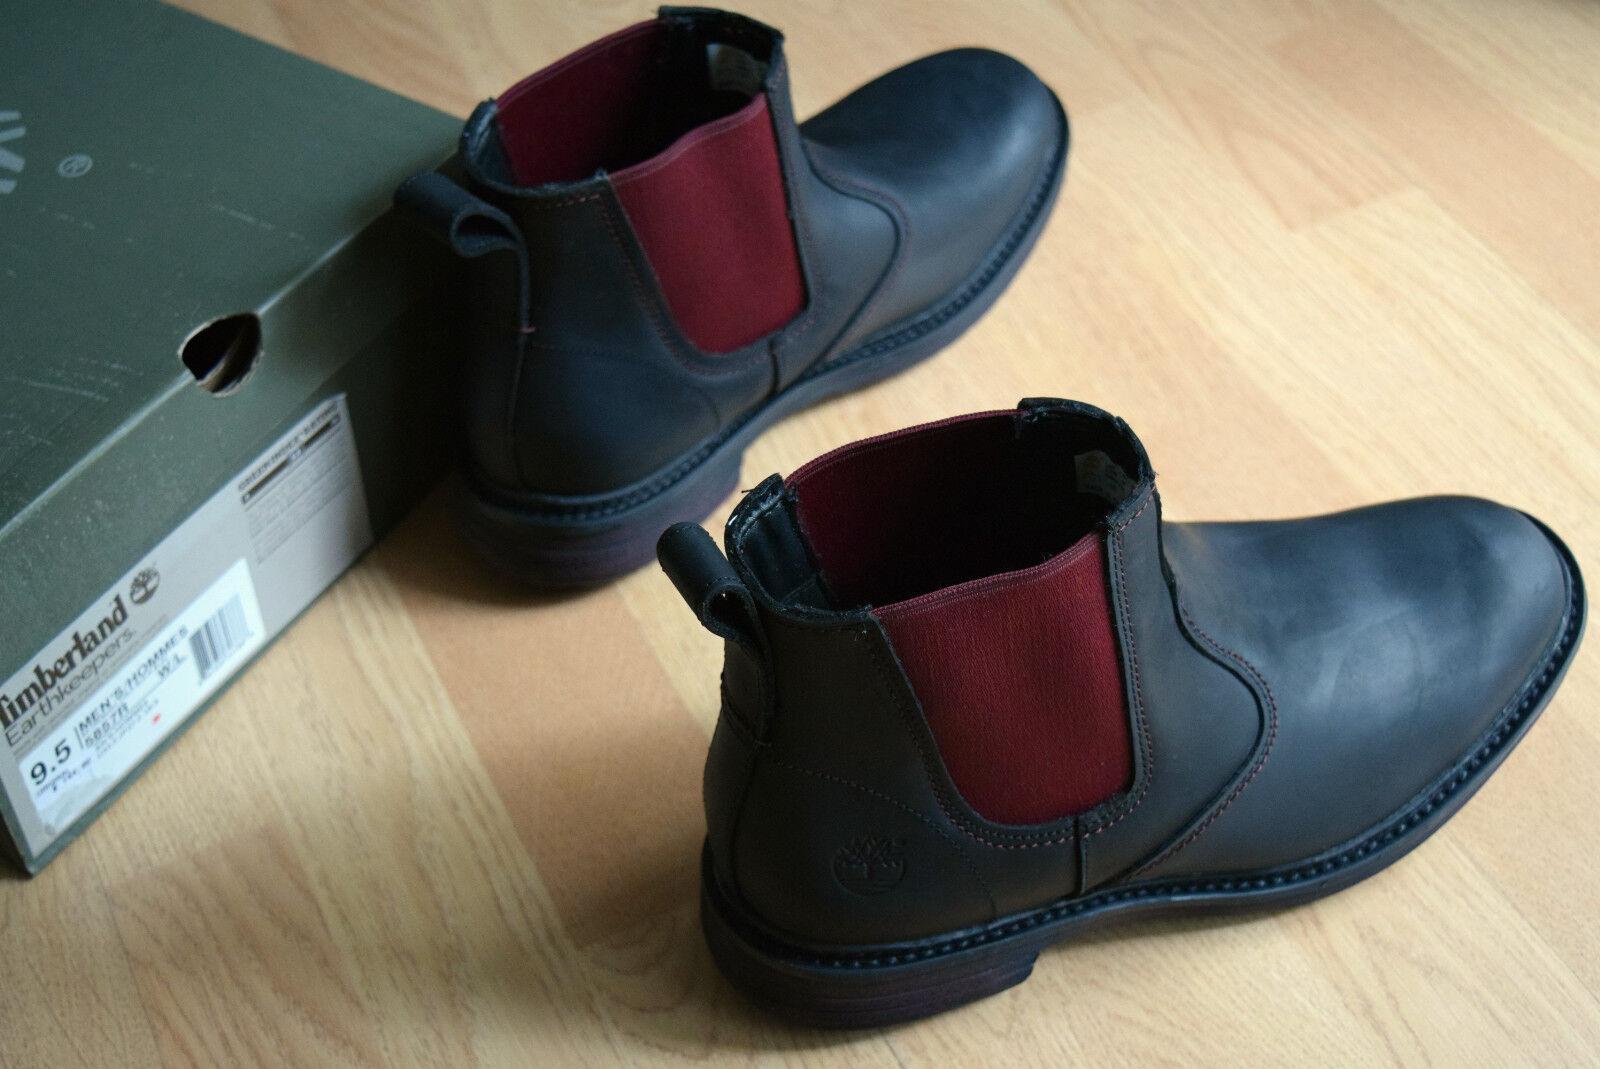 Grandes descuentos nuevos zapatos Paul Smith samo zapatillas azul